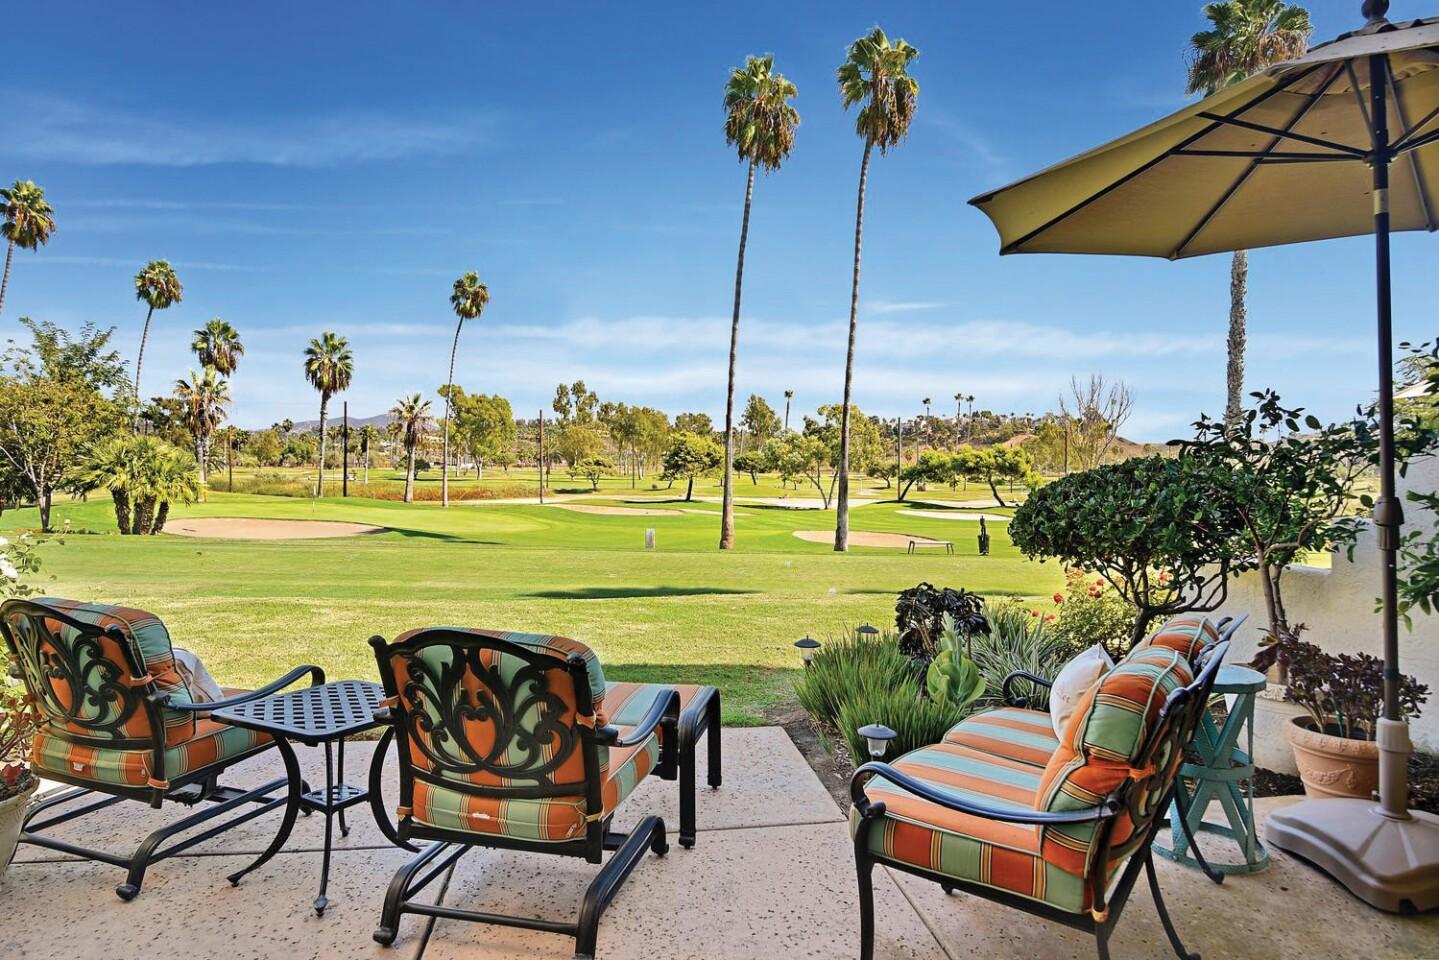 Home of the Week - 4031 Avenida Brisa, Rancho Santa Fe